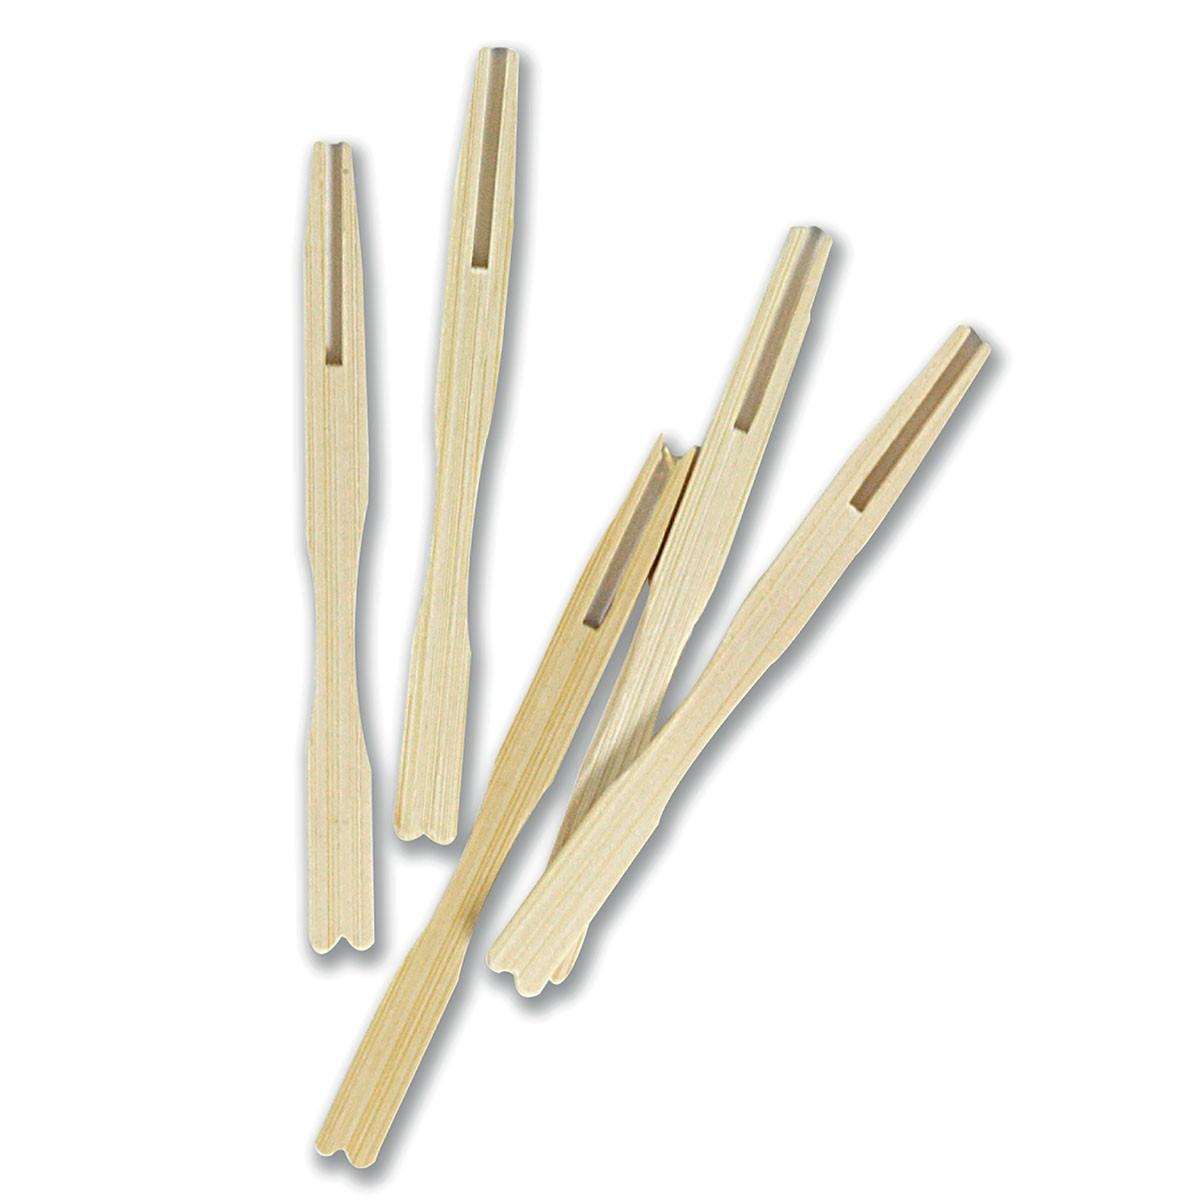 2-Prong Bamboo Pick 9.5cm | 500pcs